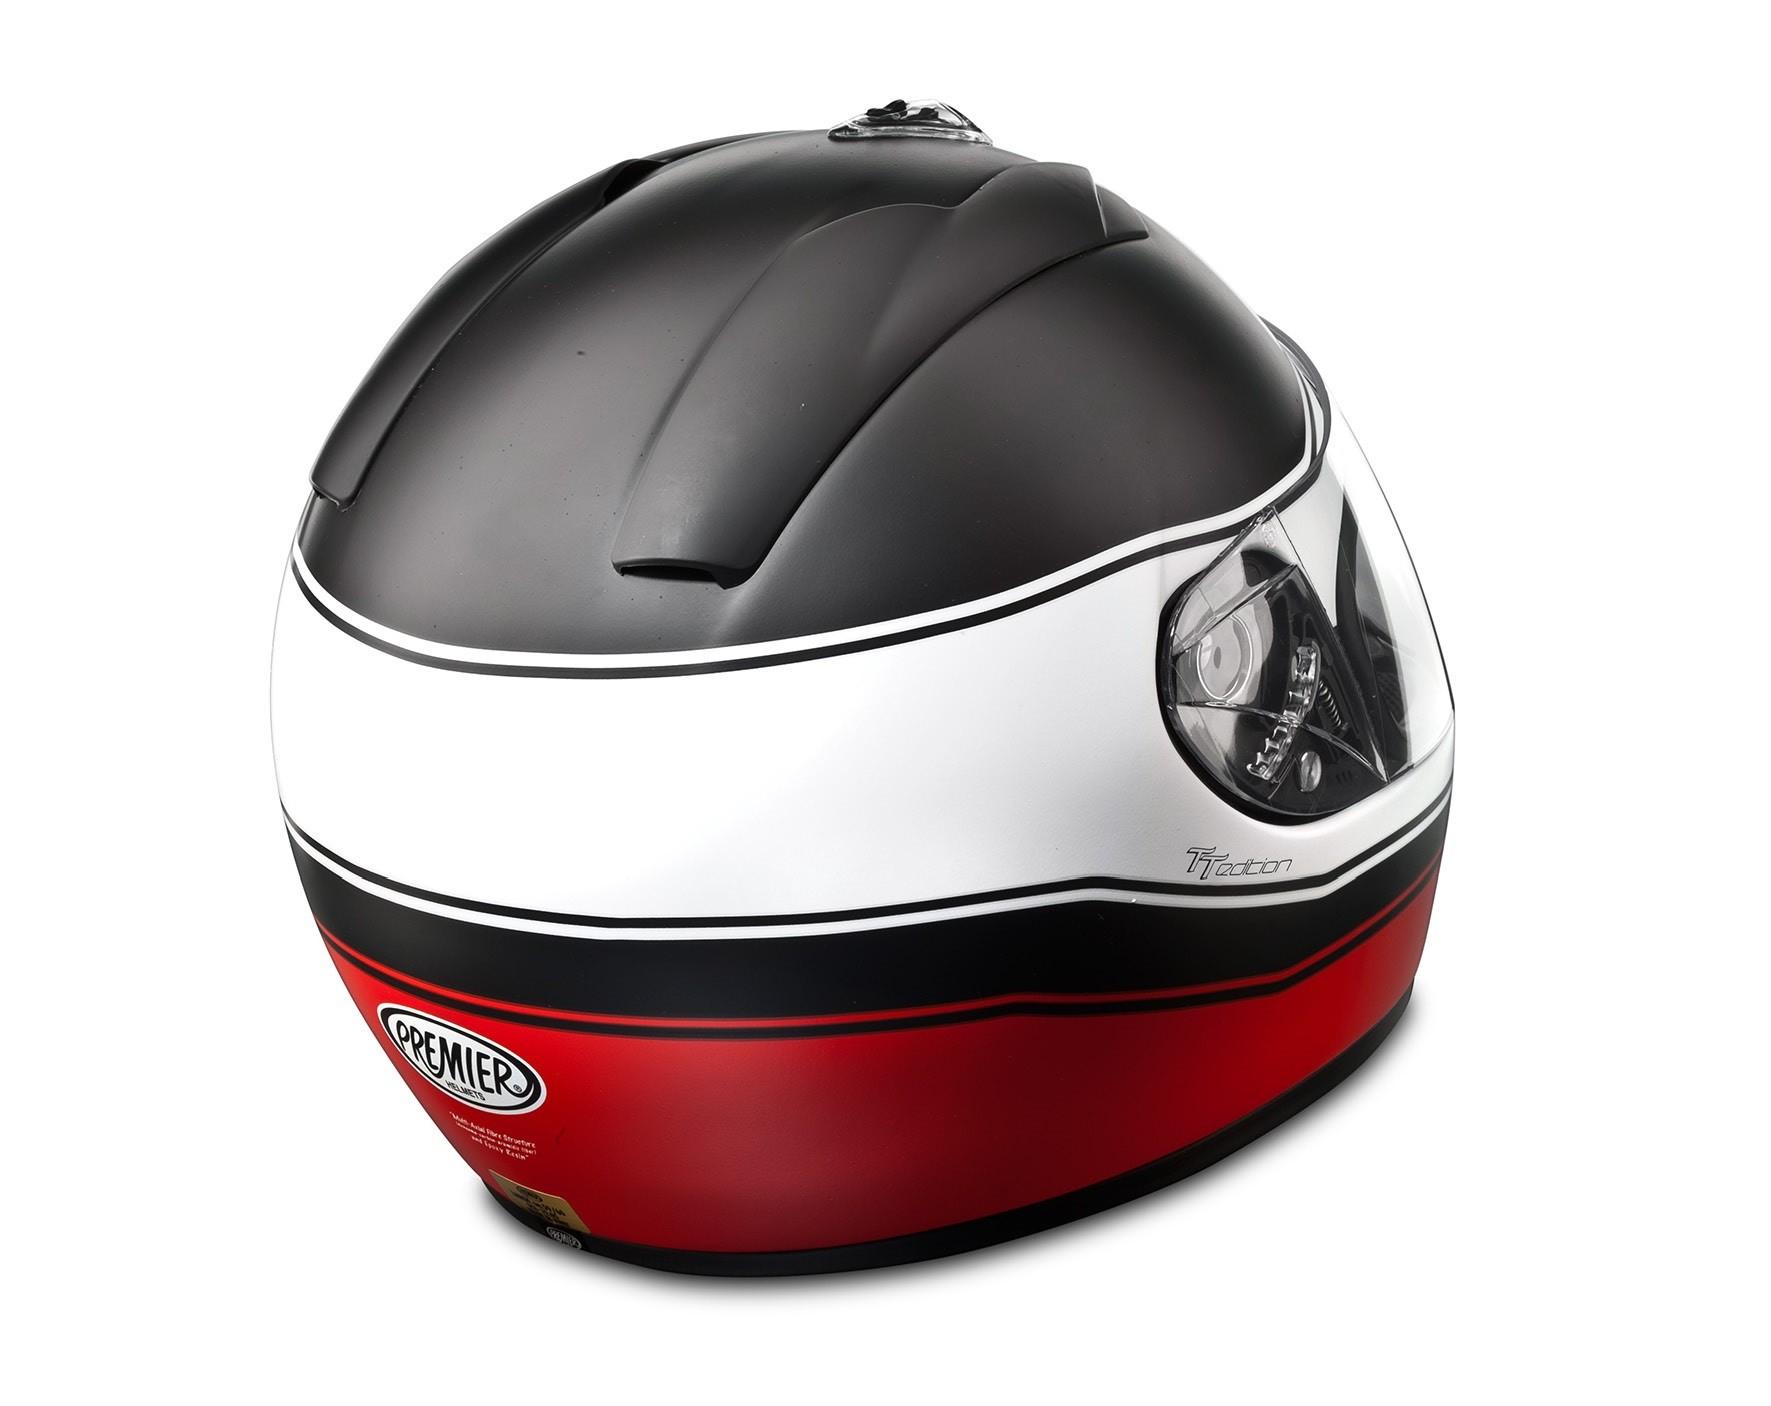 style-helm-tt2 achterzijde